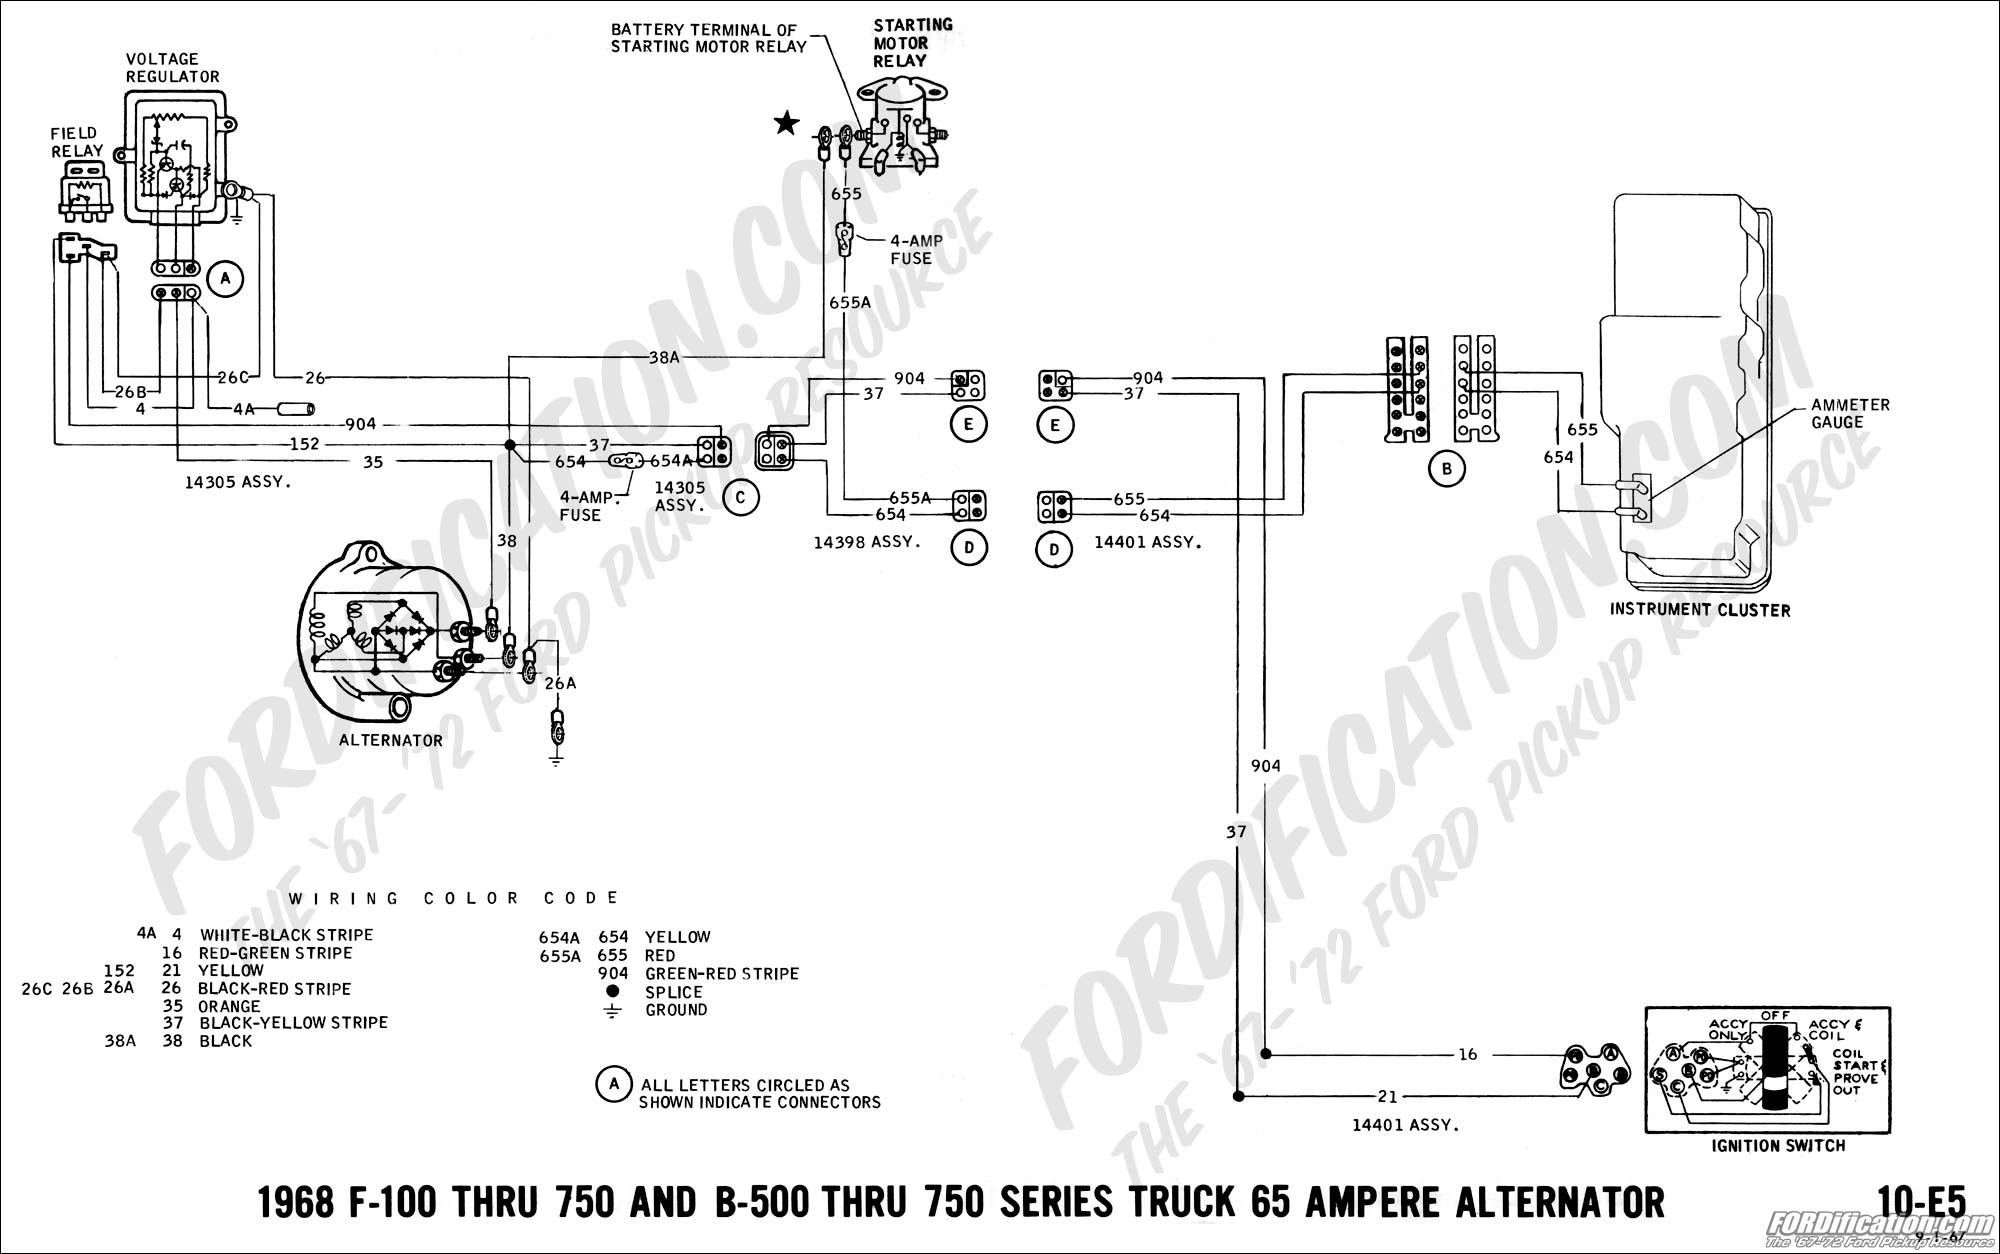 1988 Ford Alternator Wiring Diagram - All Wiring Diagram Data - One Wire Alternator Wiring Diagram Ford